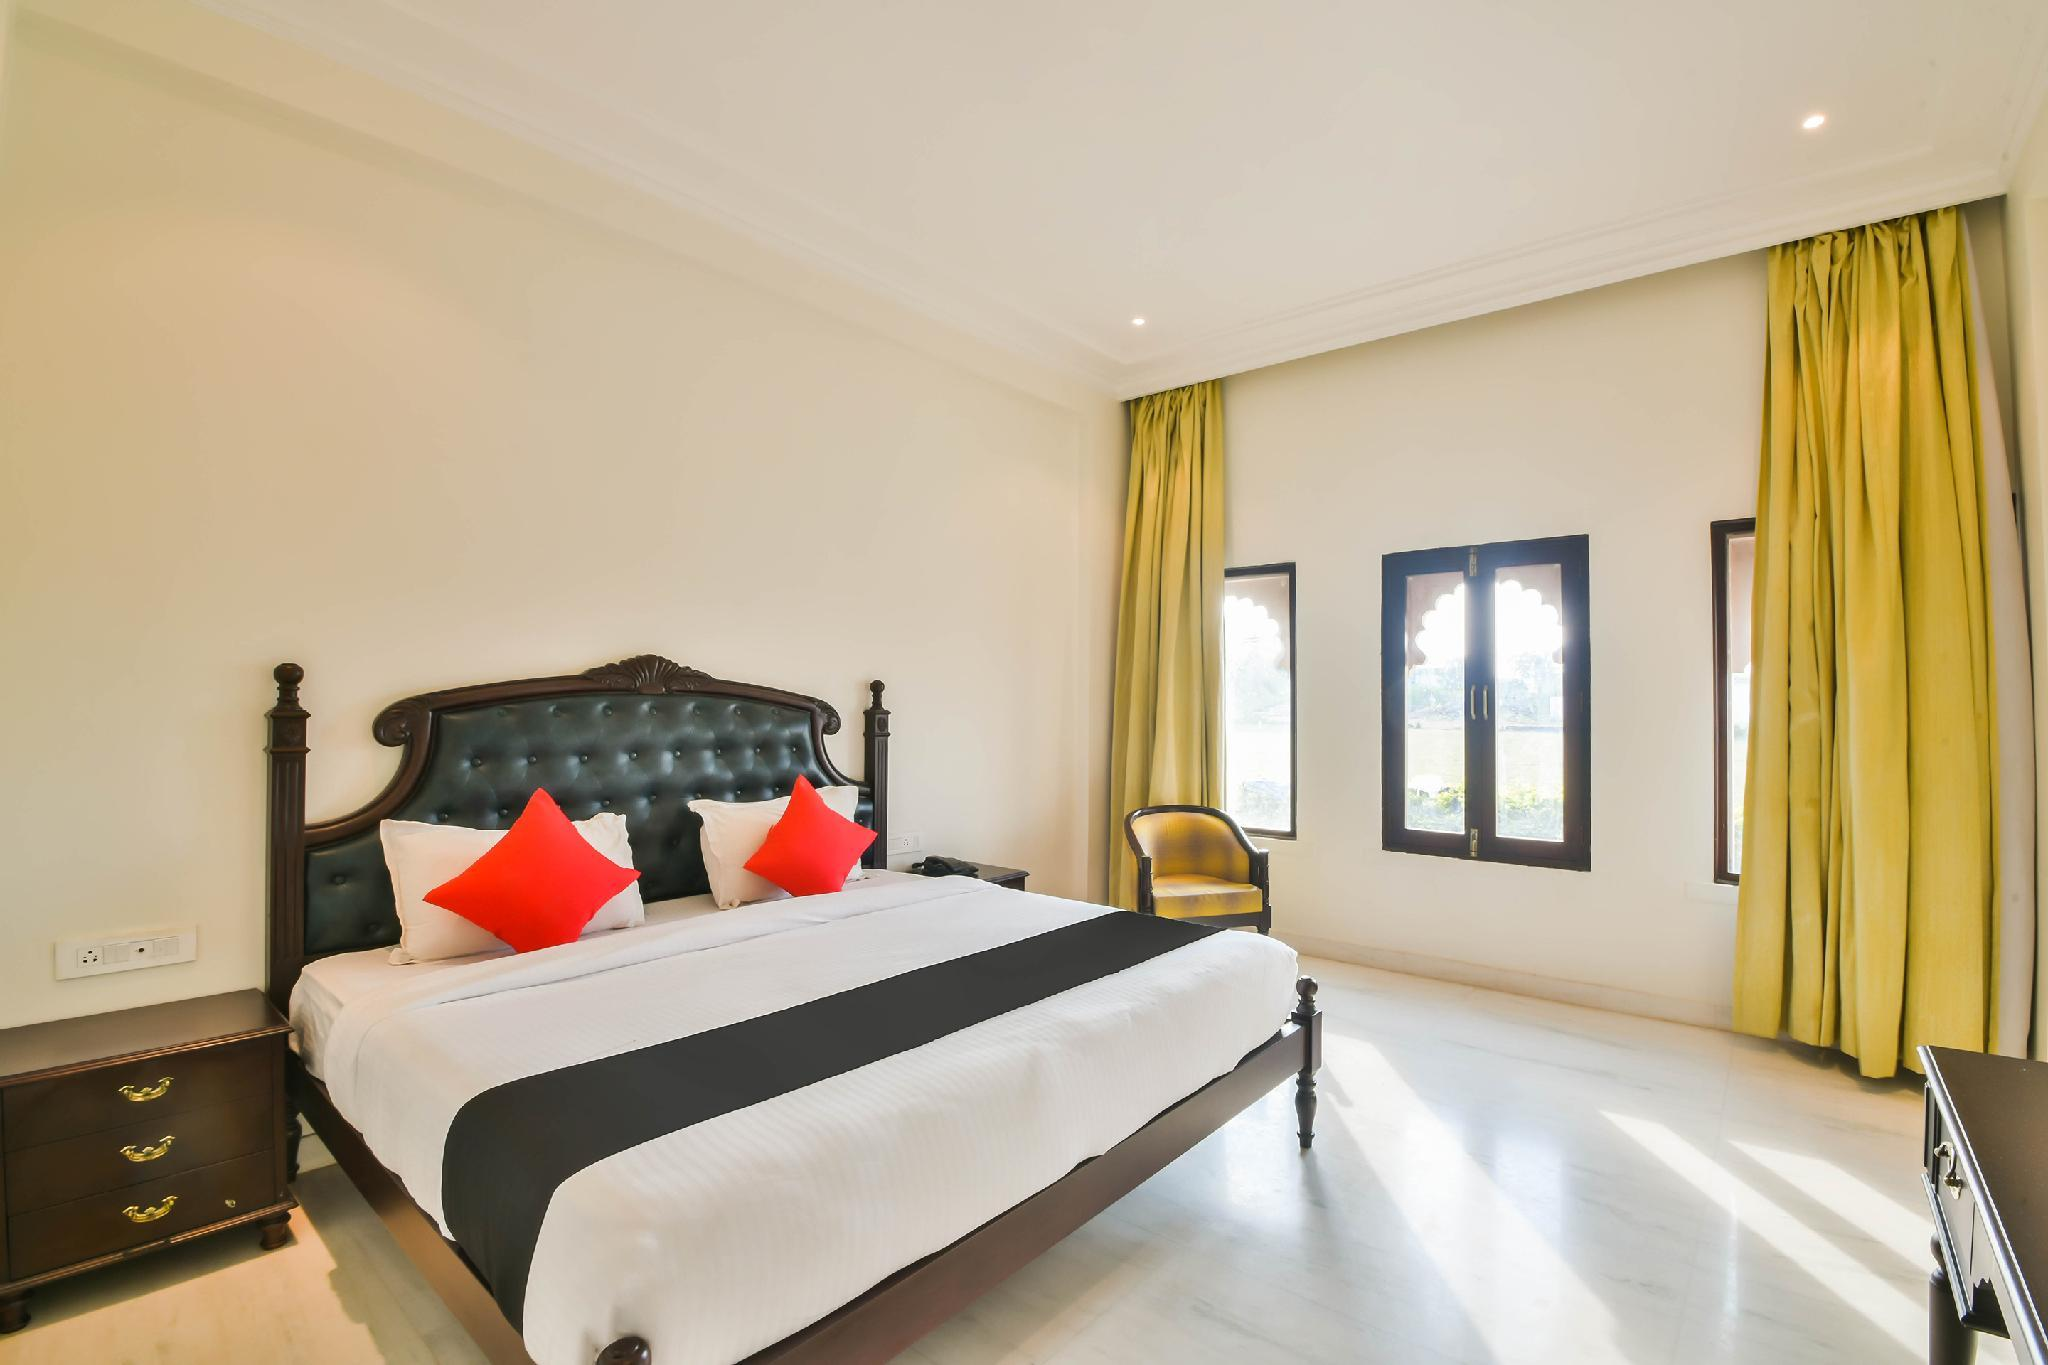 Capital O 64286 Hotel Bhairav Palace And Restaurant